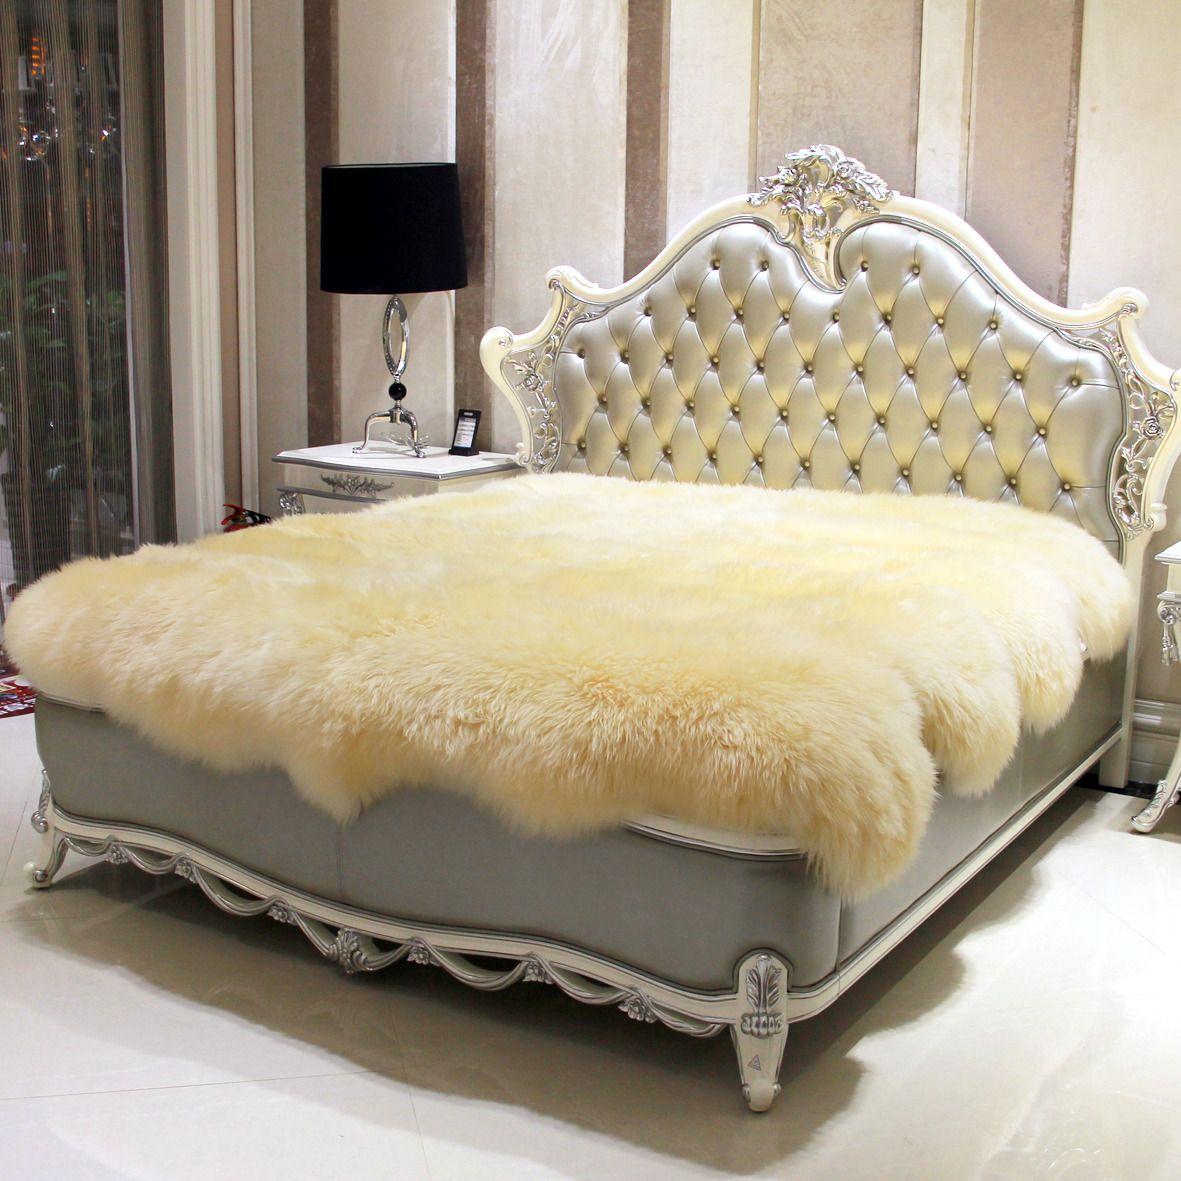 Cheap Mattress Pad Buy Quality Wool Mattress Directly From China Padded Bedspreads Suppliers Wool Mattress Fur One Fur Blanket Bed Wool Mattress Mattress Pad